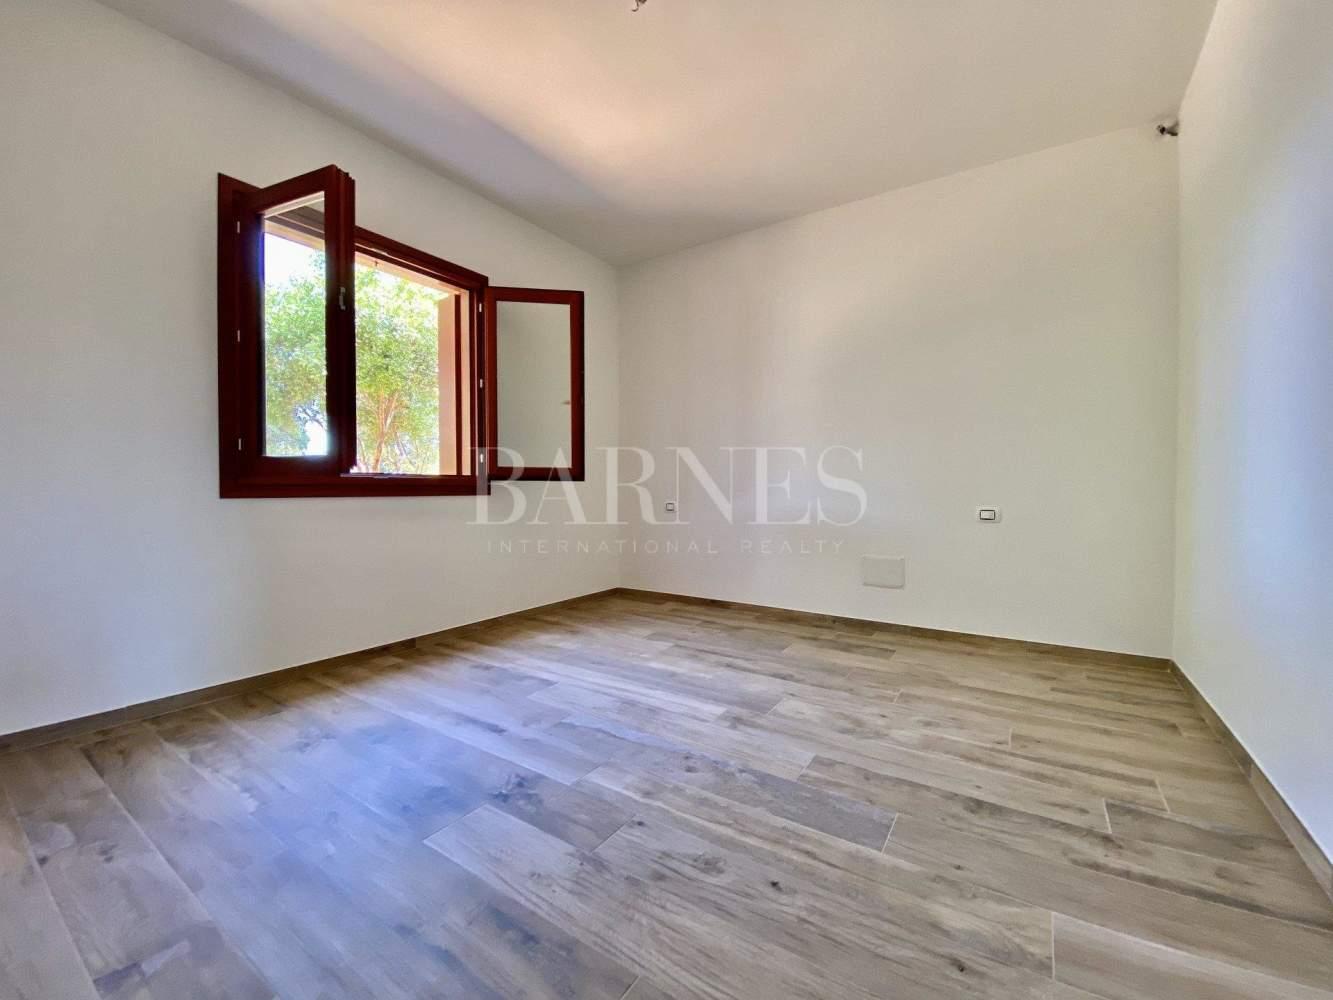 San Teodoro  - Maison 3 Pièces 2 Chambres - picture 17